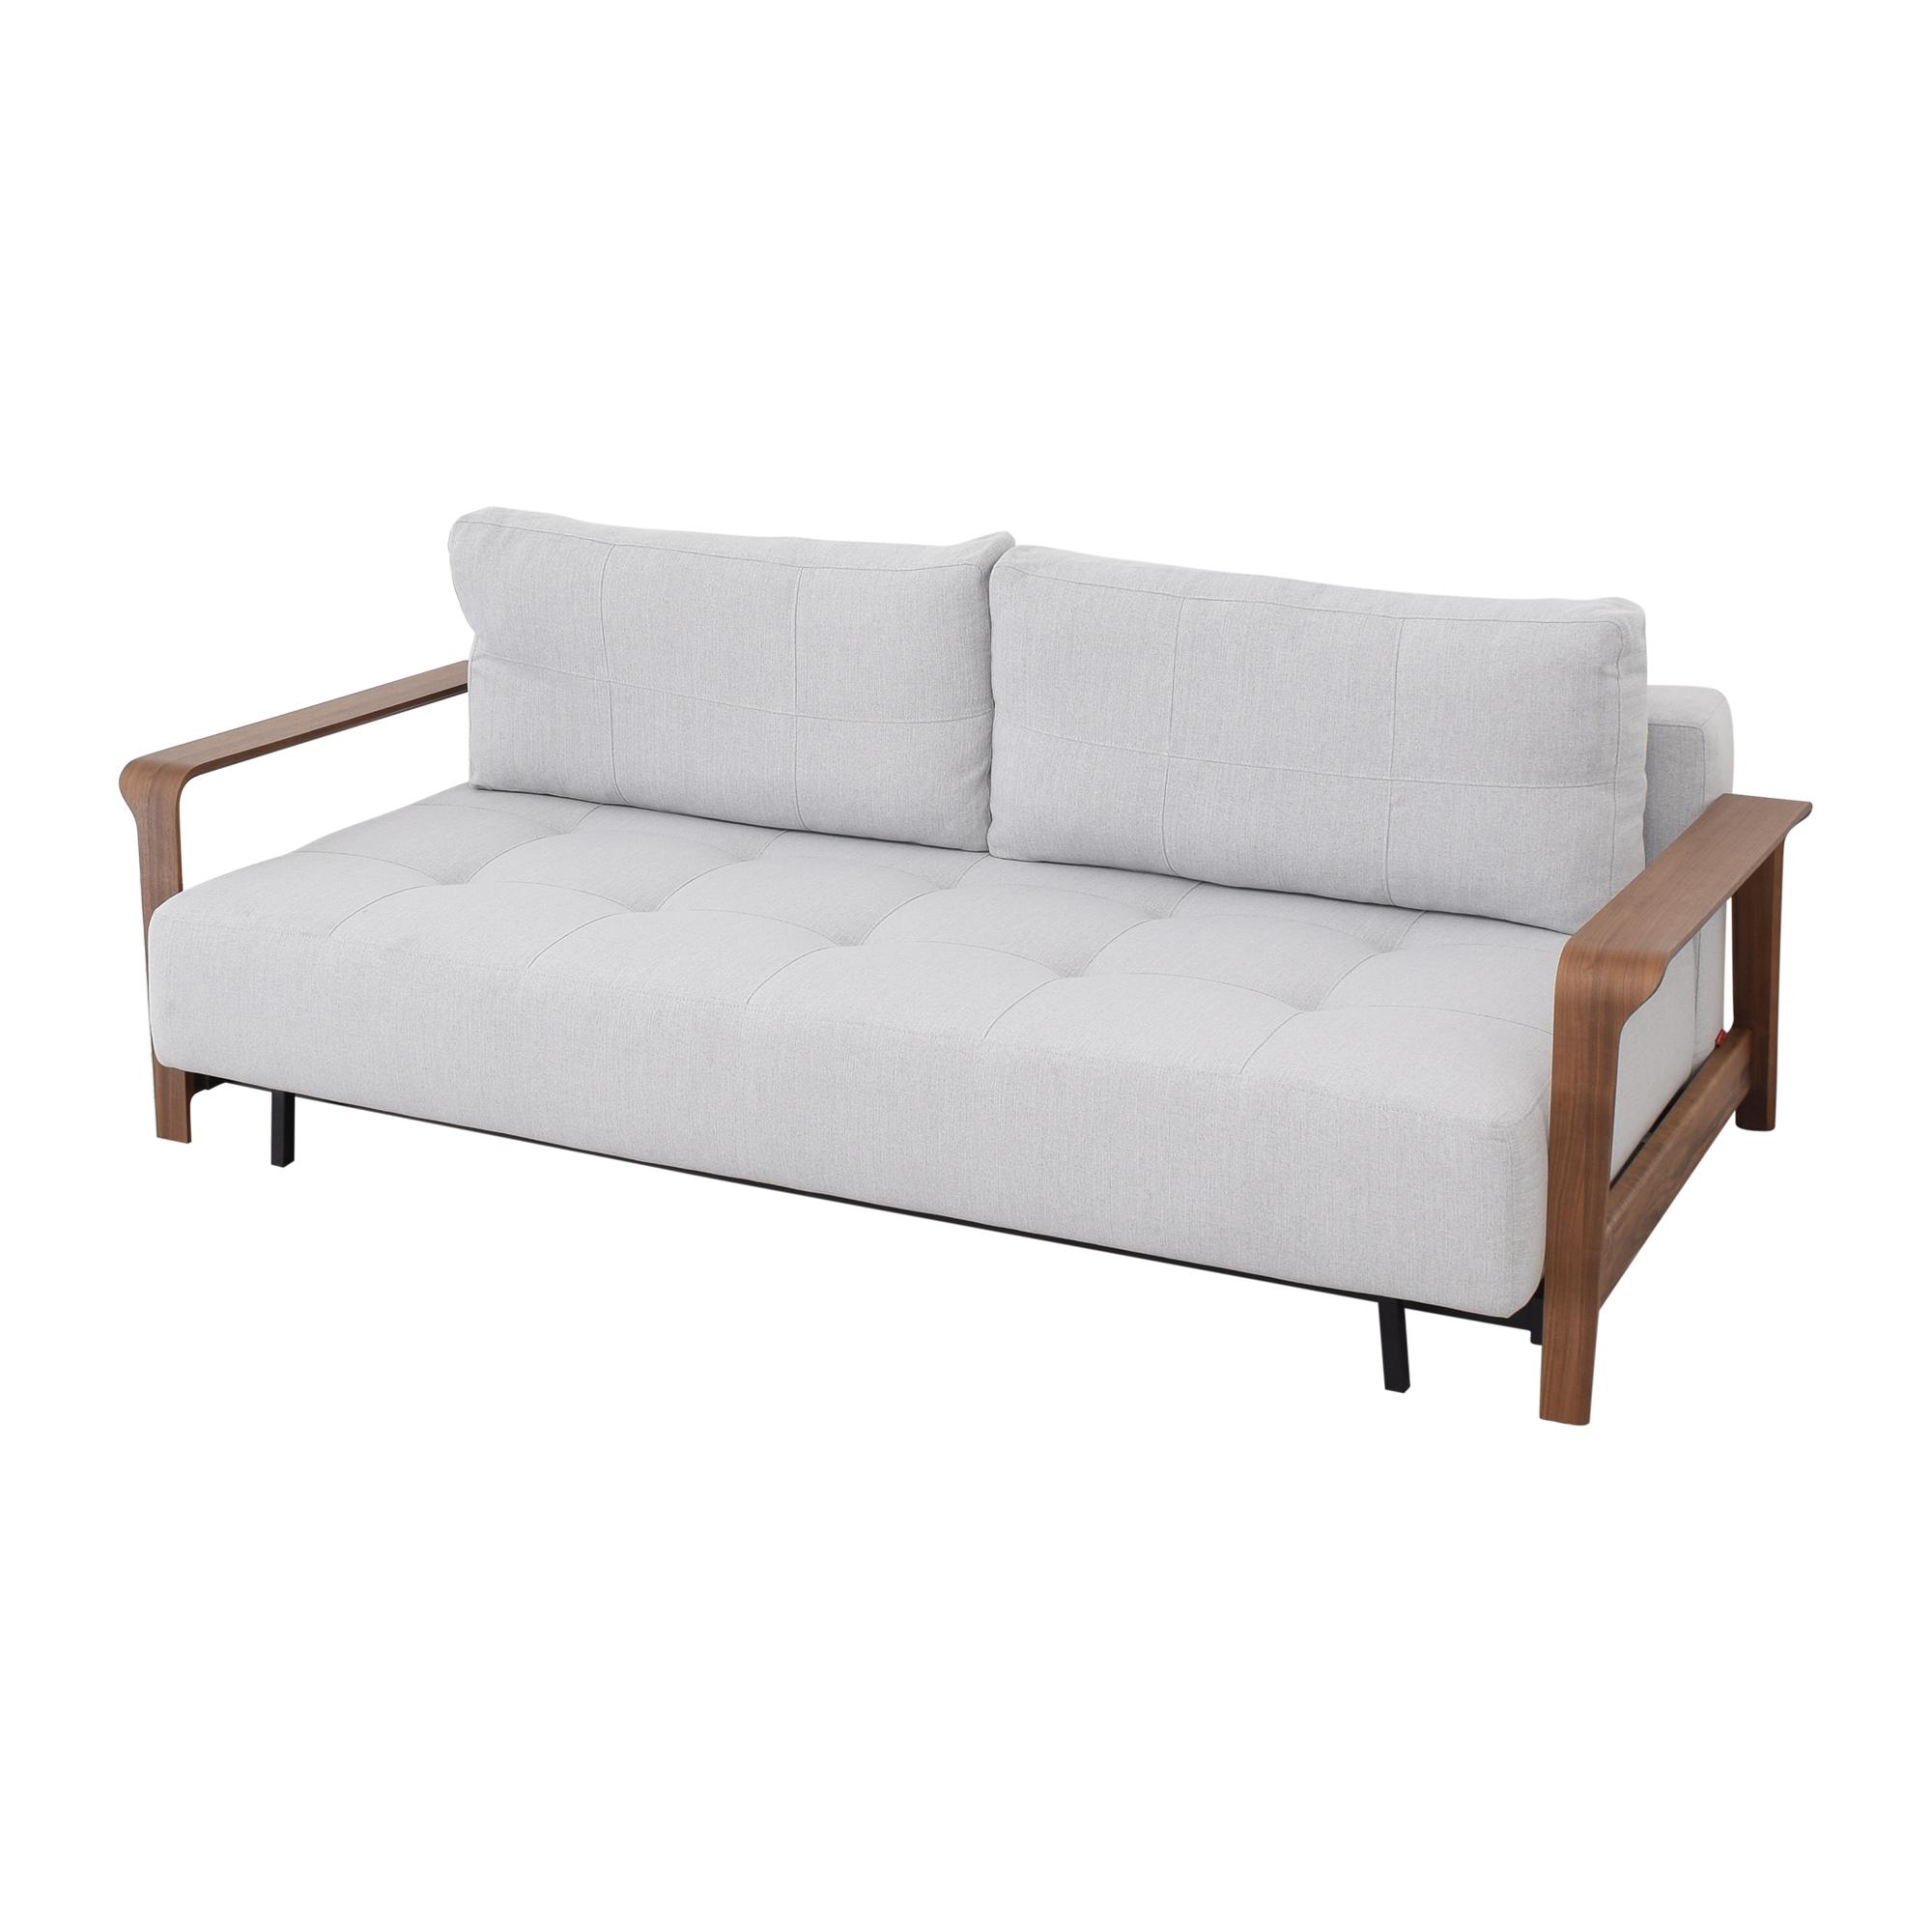 Innovation Living Innovation Living Ran Deluxe Sofa Bed ct